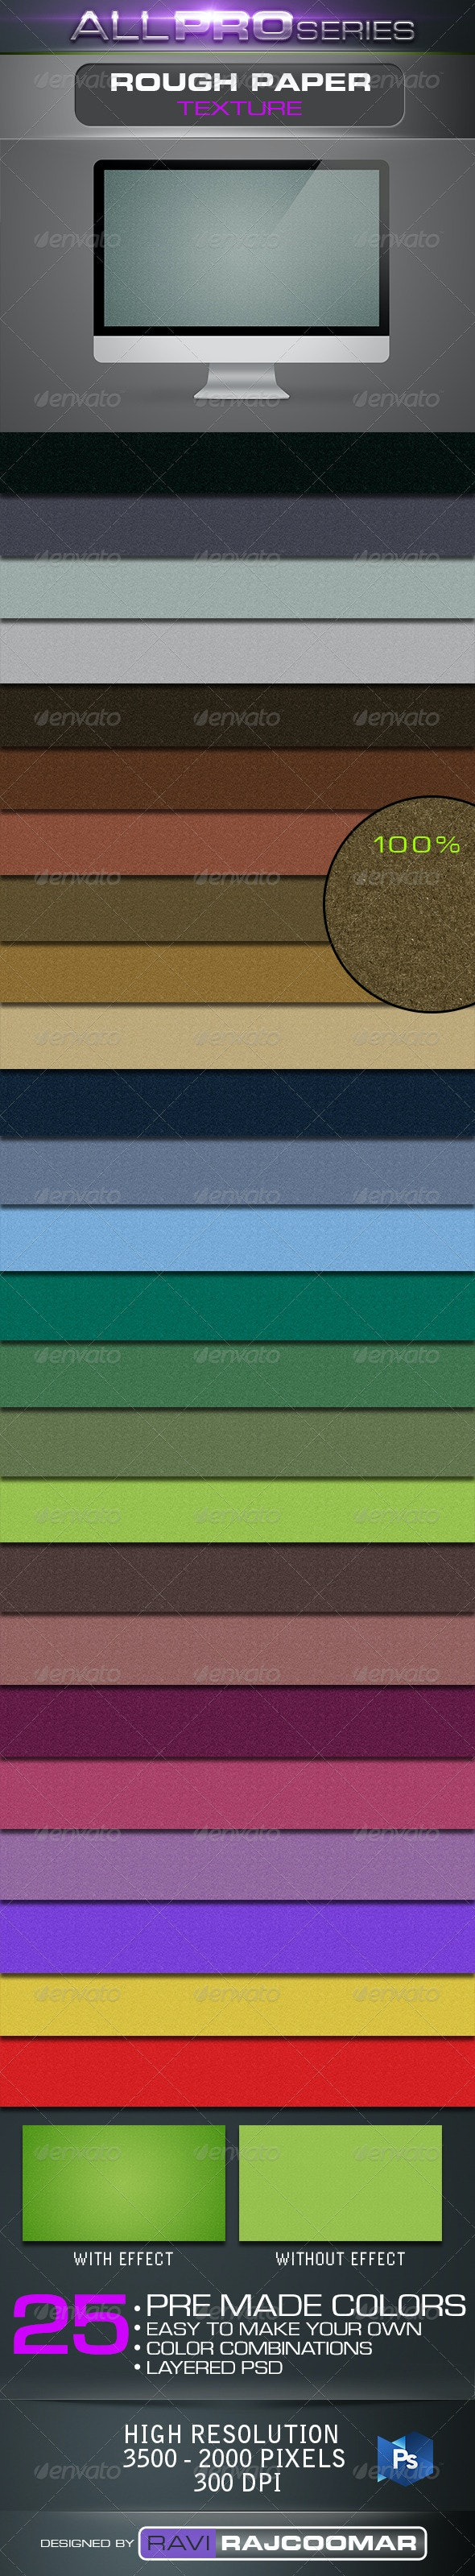 Rough Paper Texture - Patterns Backgrounds